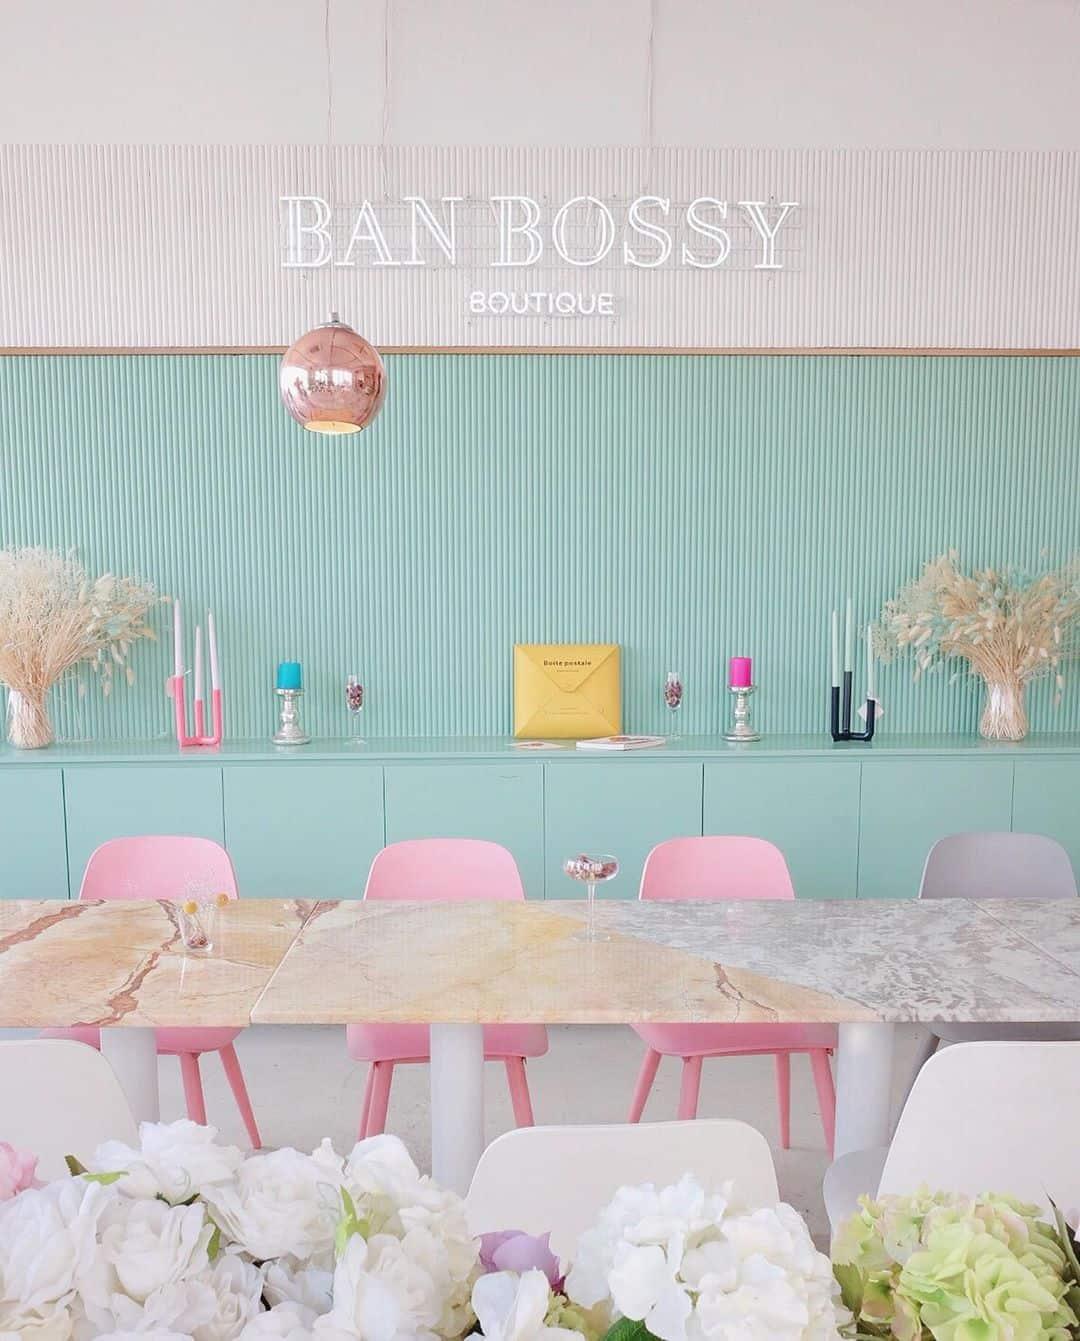 Ban Bossy/Chris Garden, Seoul